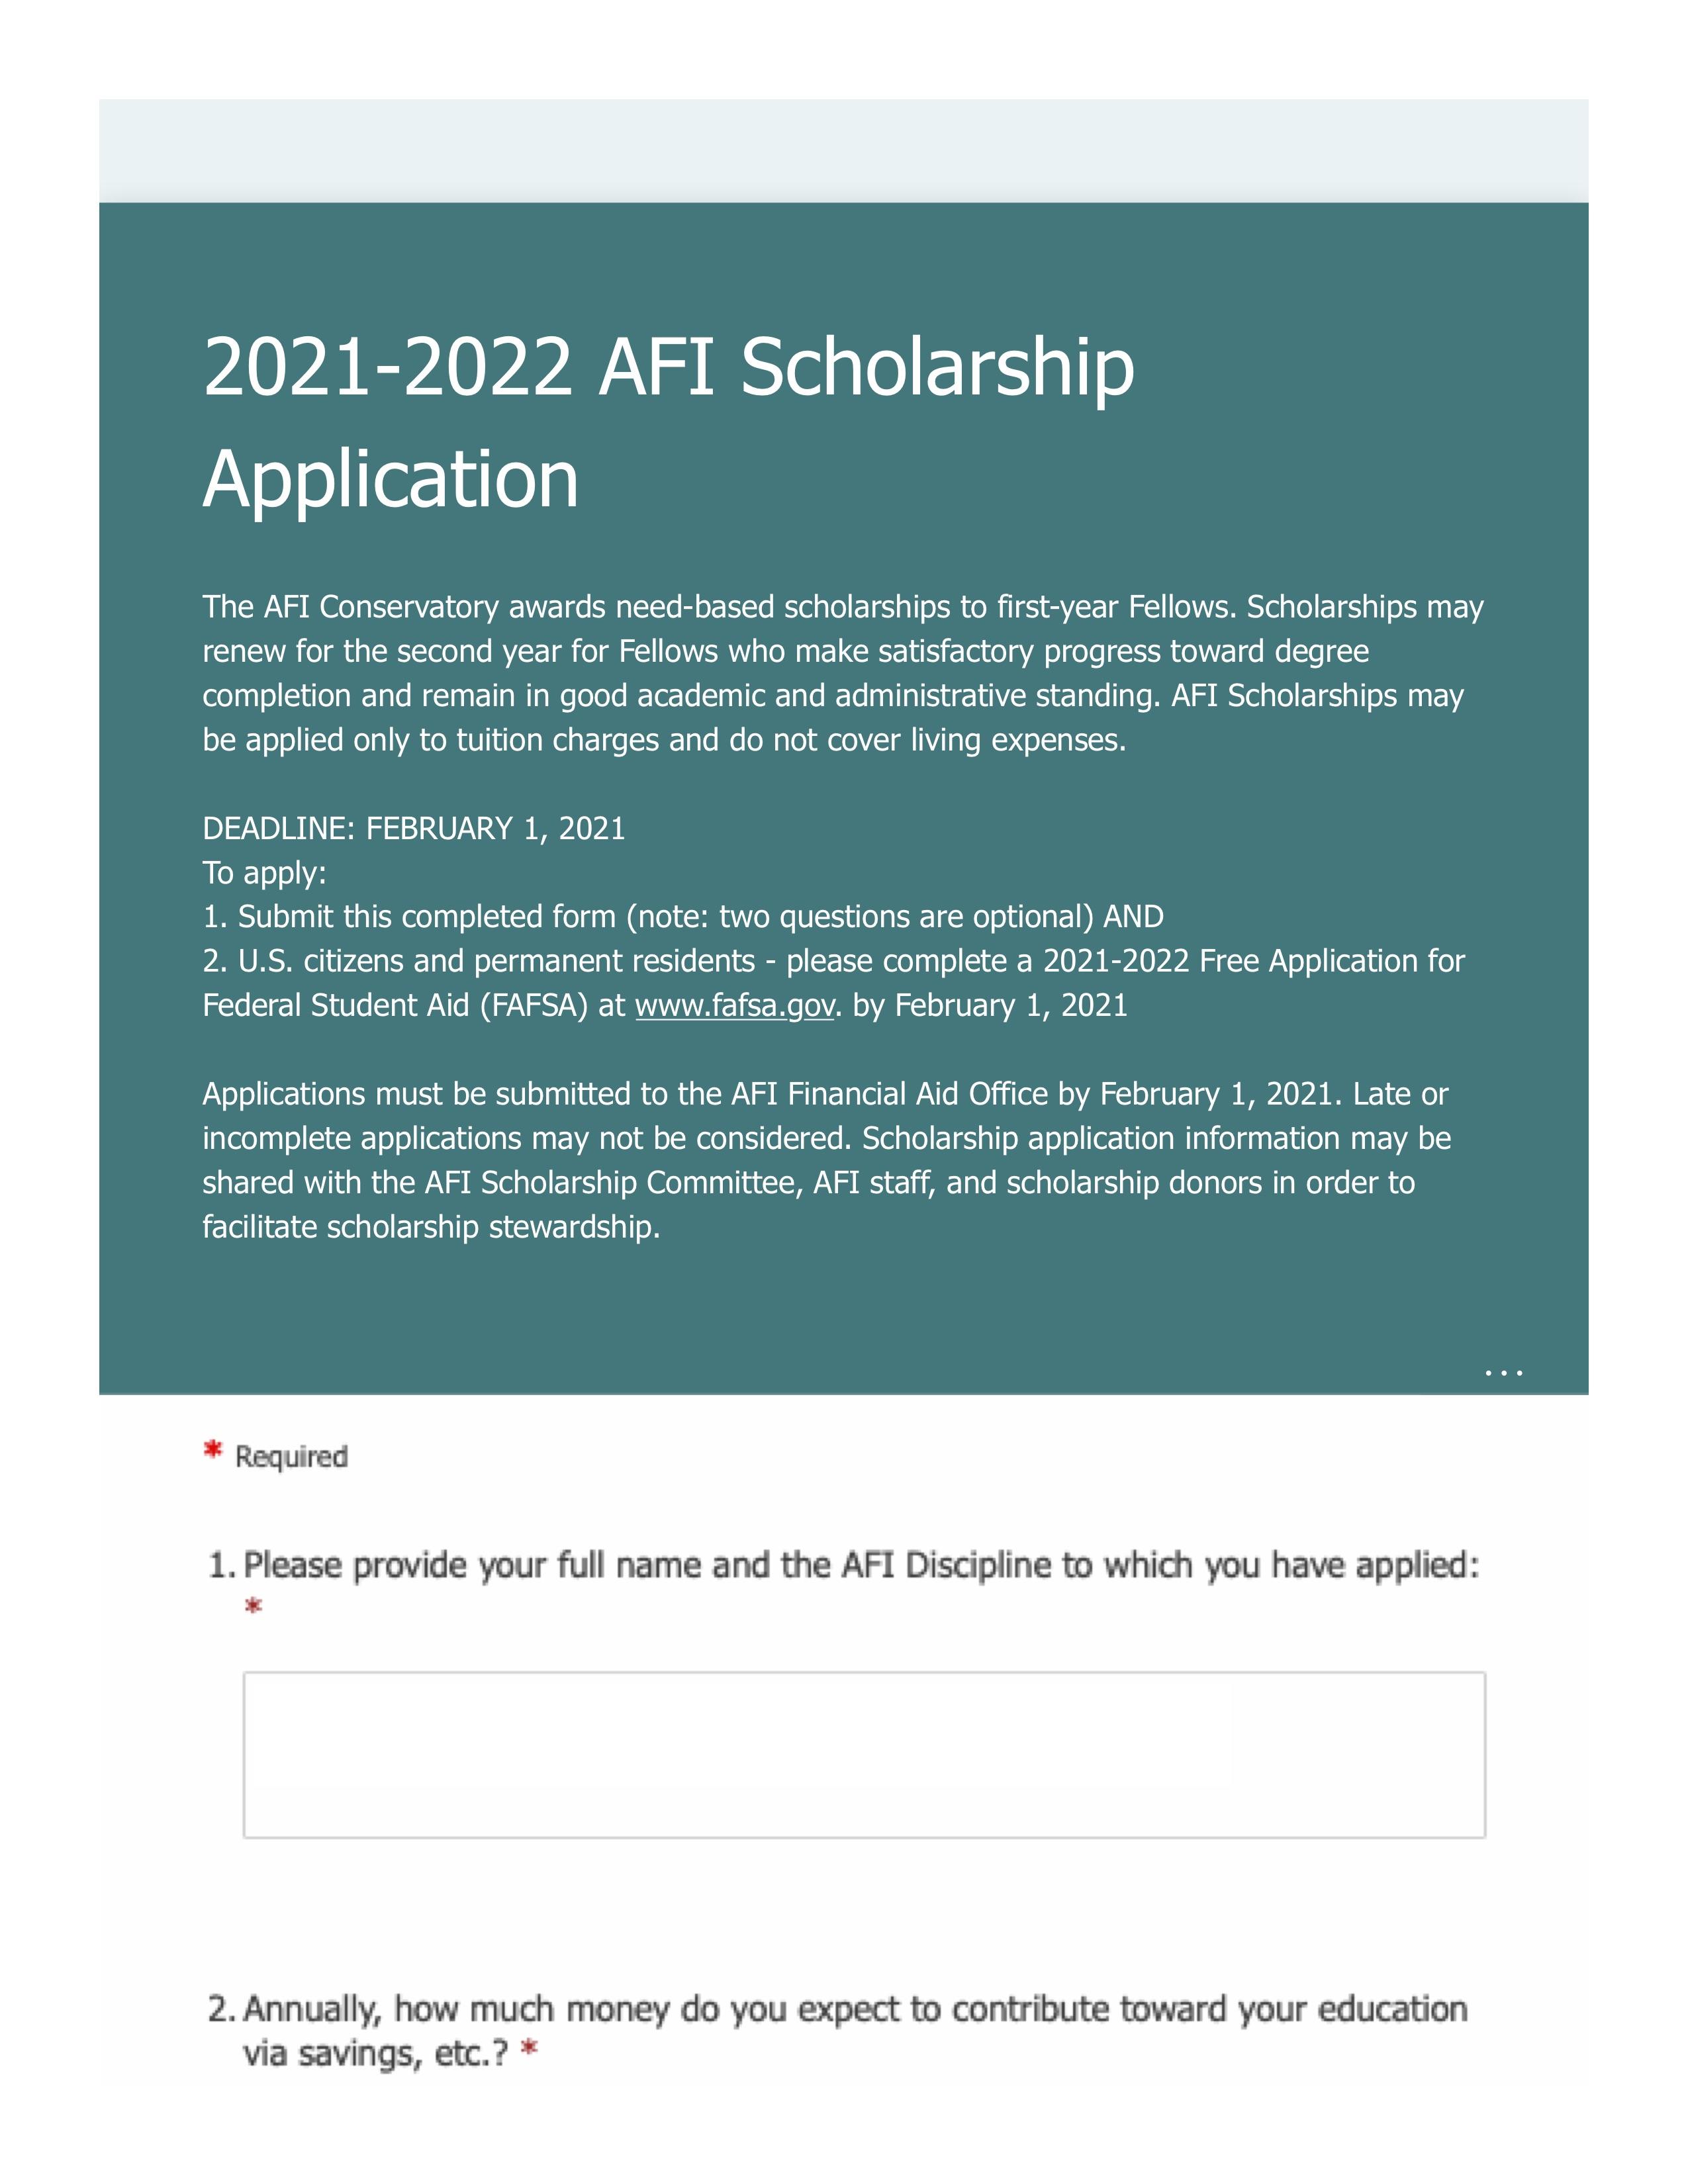 2021-2022 AFI Scholarship Application p1.jpg